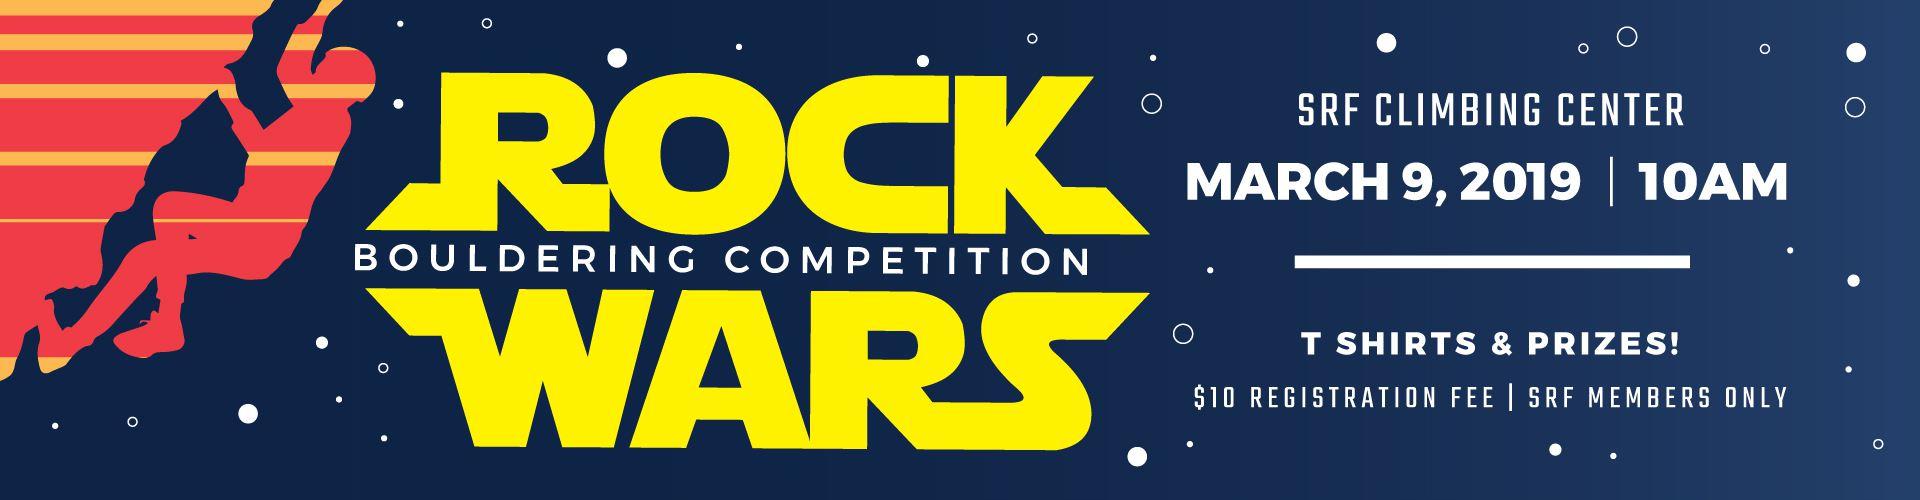 rock wars bouldering competition